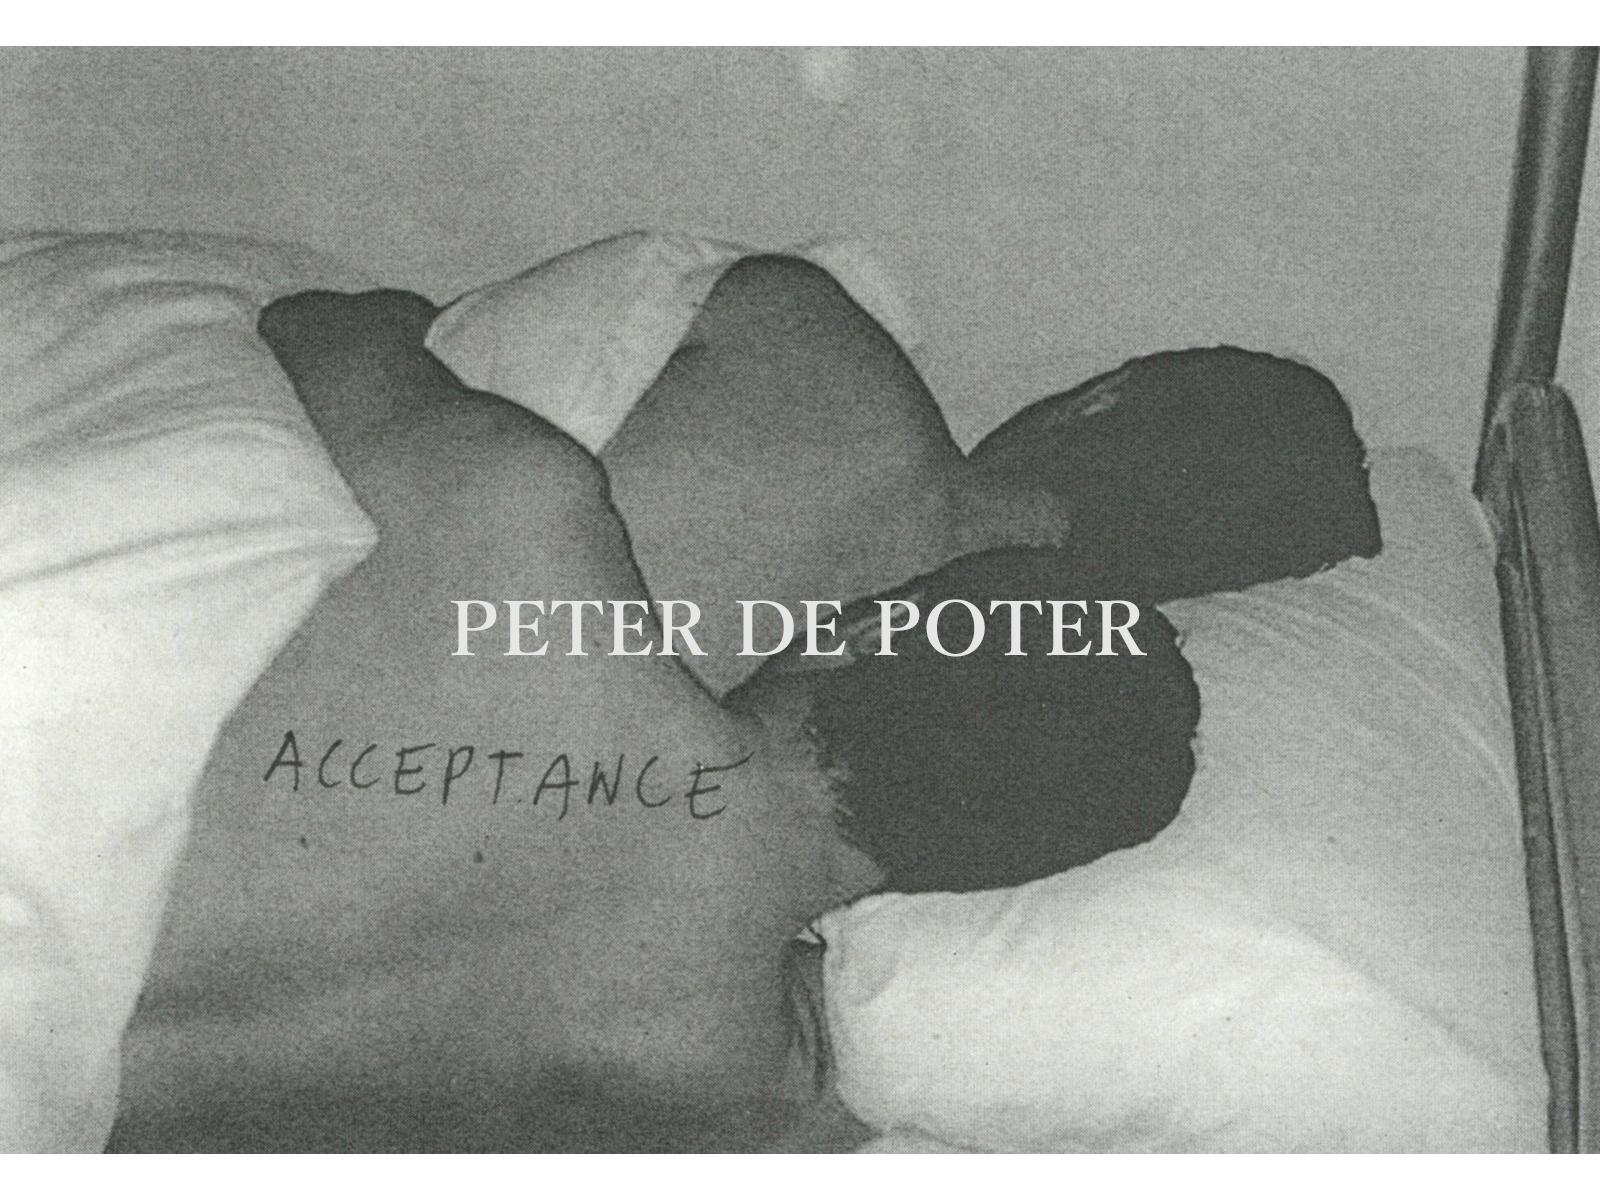 PETER DE POTTER